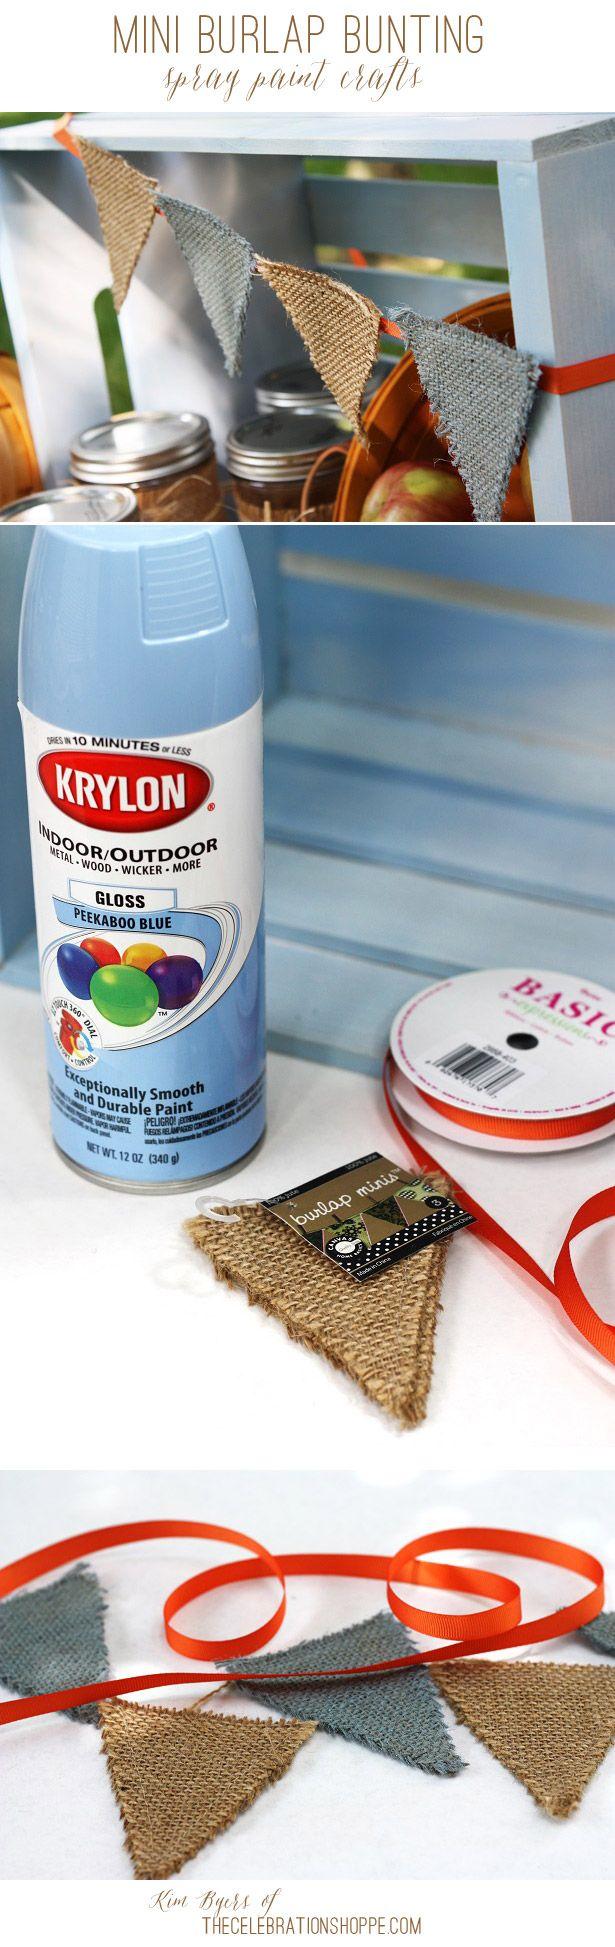 Spray Paint Craft – Fall Harvest Mini Burlap Banner   Kim Byers, TheCelebrationShoppe.com #easycraft #bunting #spraypaint